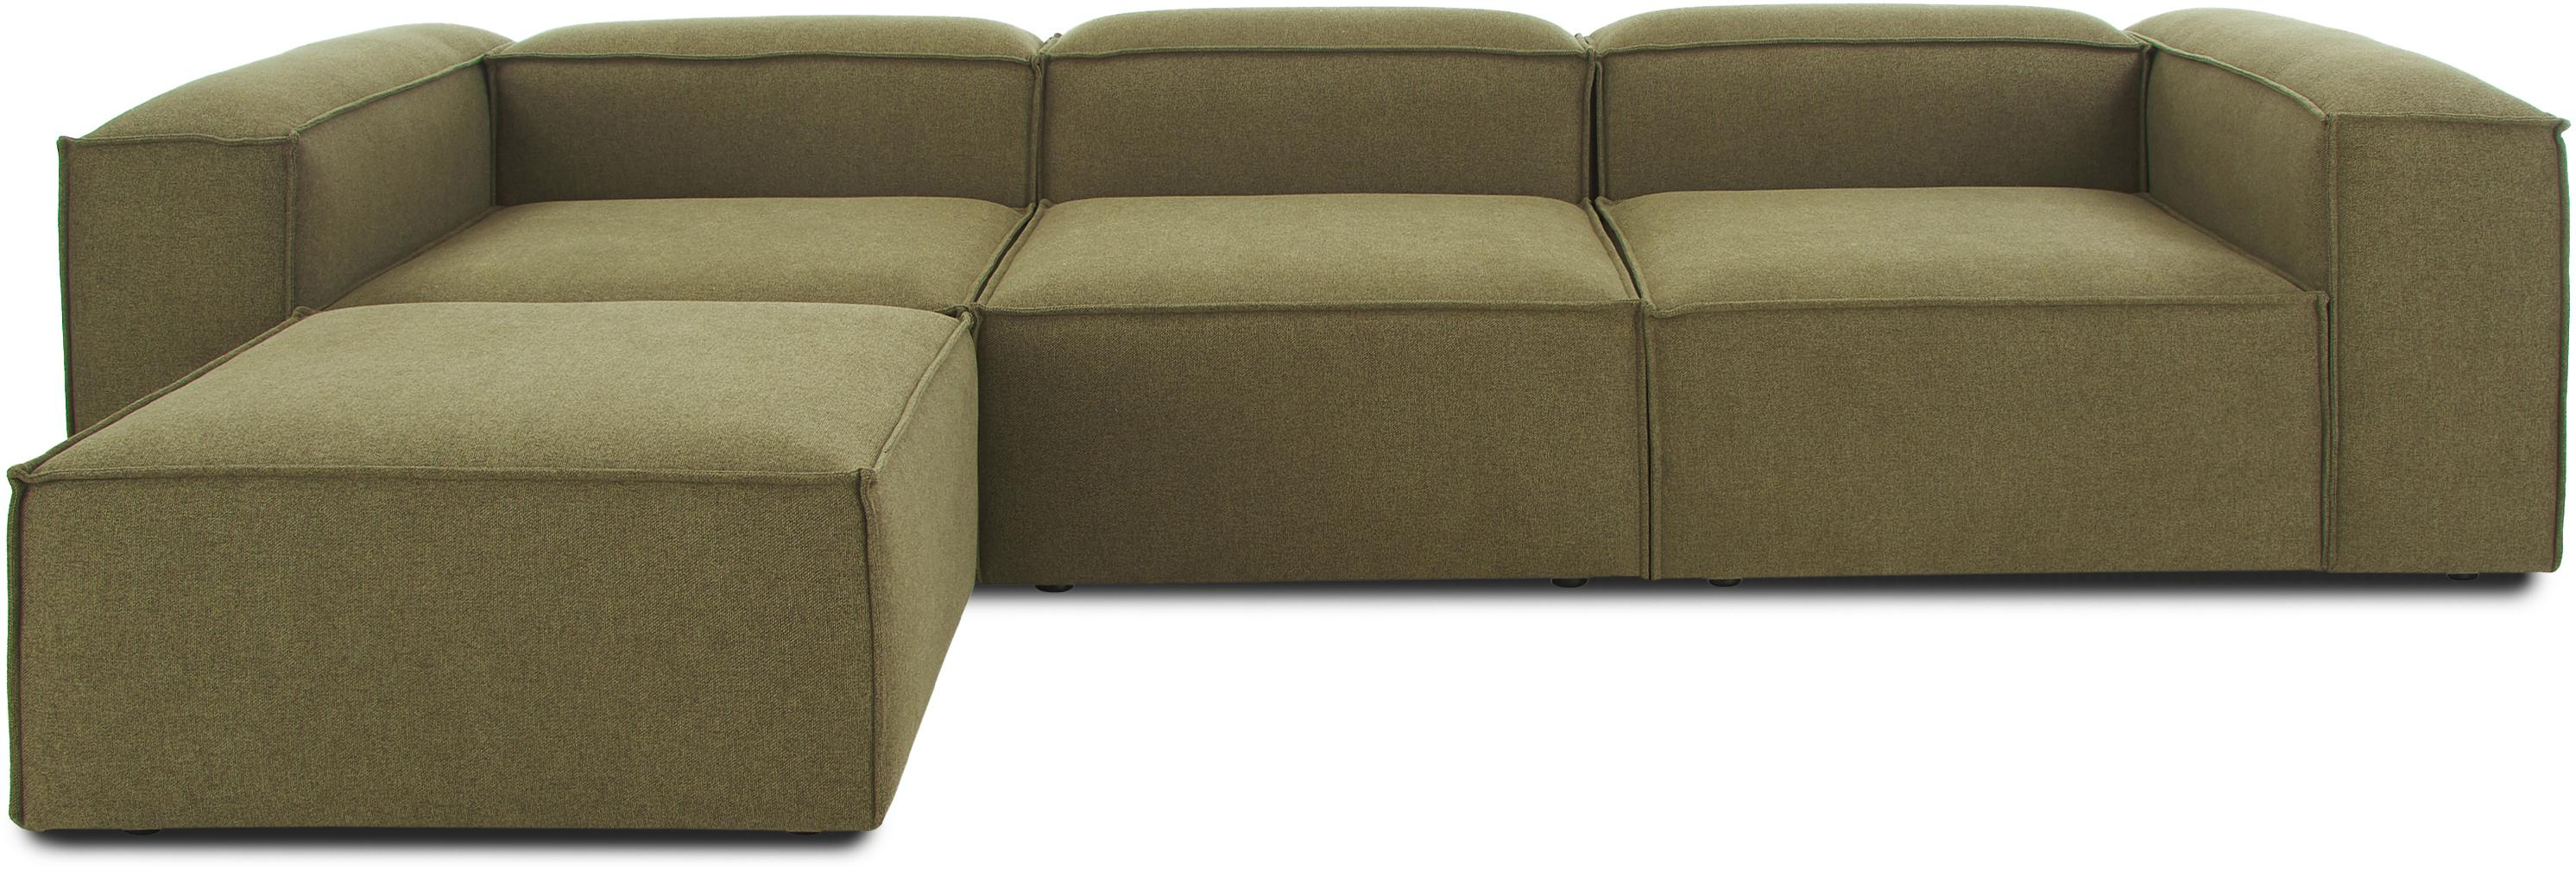 Sofá rinconera modular Lennon, Tapizado: 100%poliéster 35.000cic, Estructura: madera de pino maciza, ma, Patas: plástico, Tejido verde, An 326 x F 207 cm